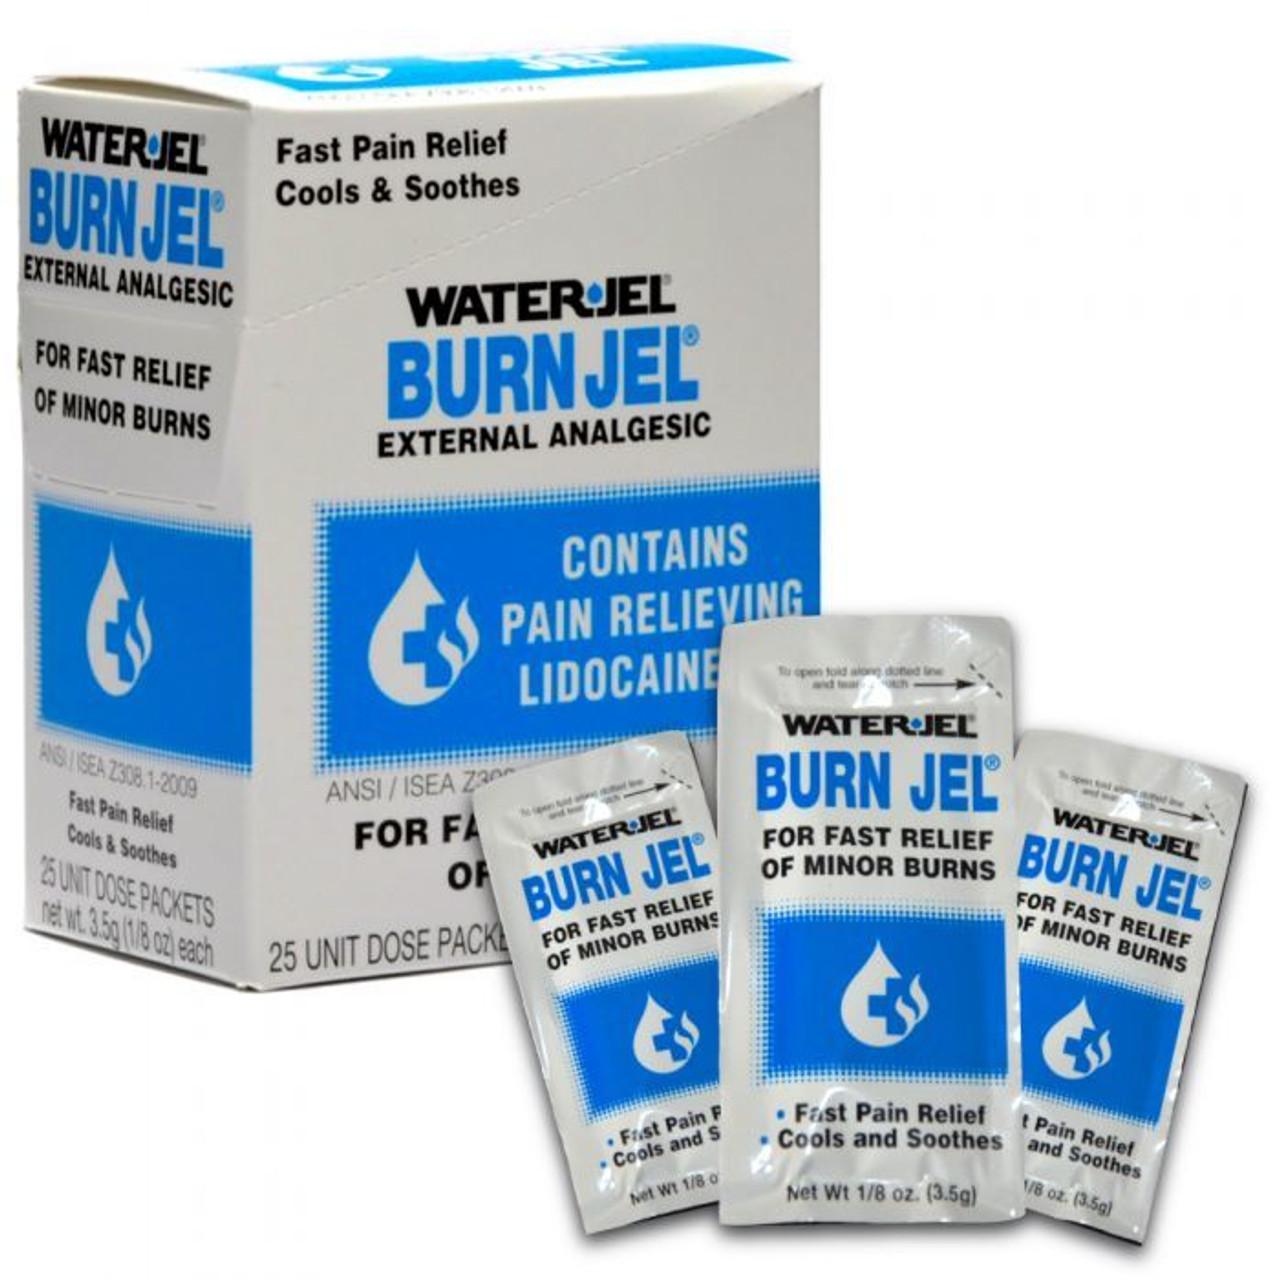 Medications, Burns & Eyewash